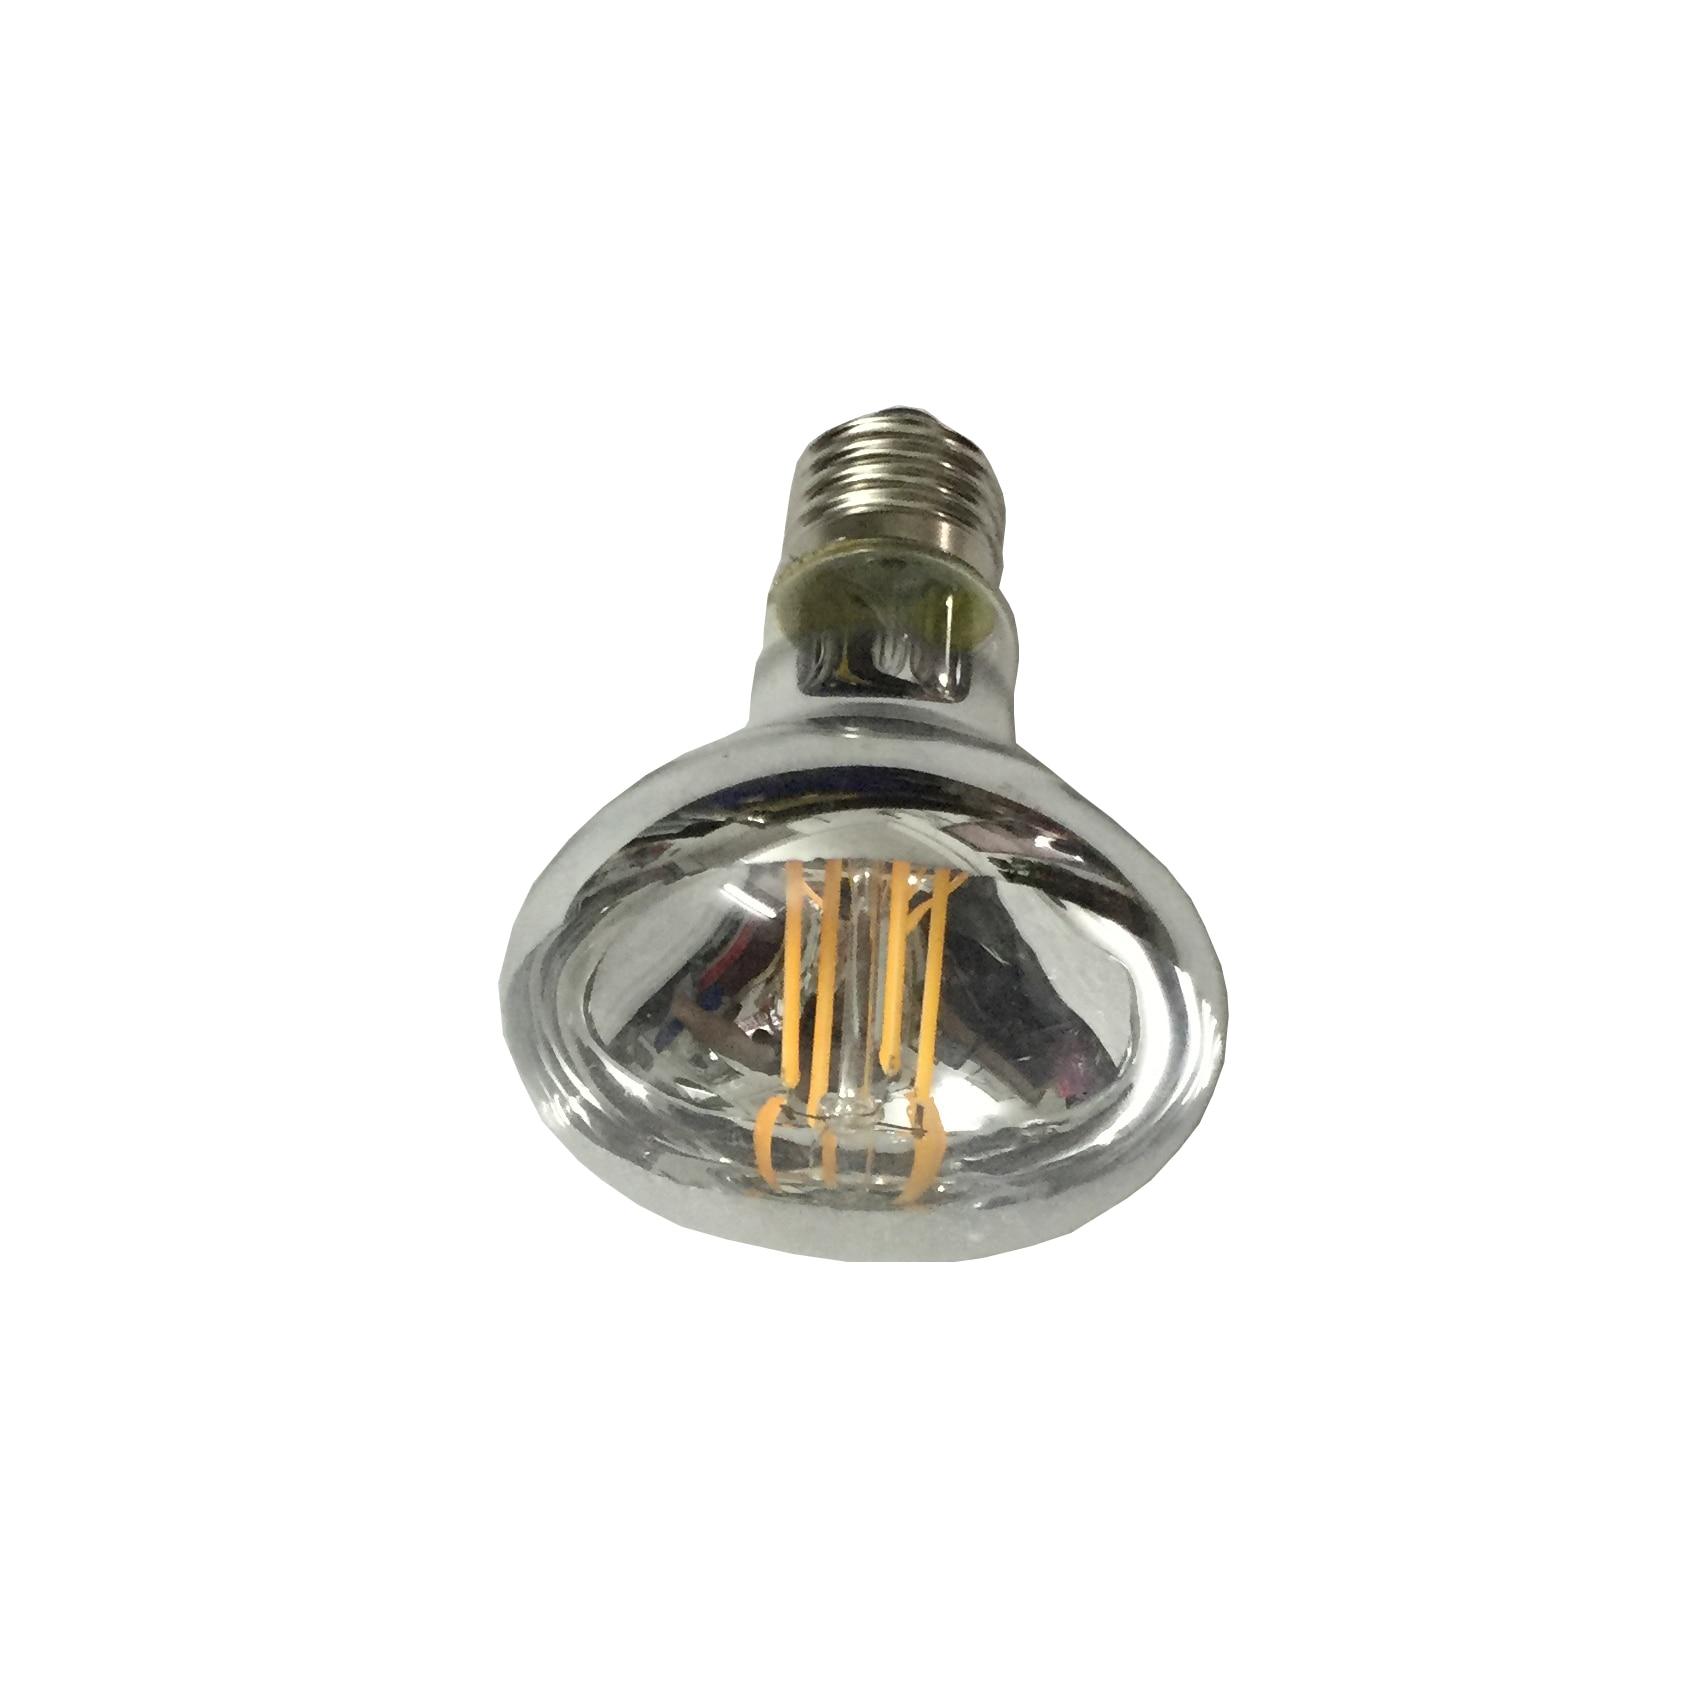 220V 240V Dimmable R80 LED Bulb Flood Light Reflector Bulb 4 Filamennt Real 6W Warm White 2700K 3000K